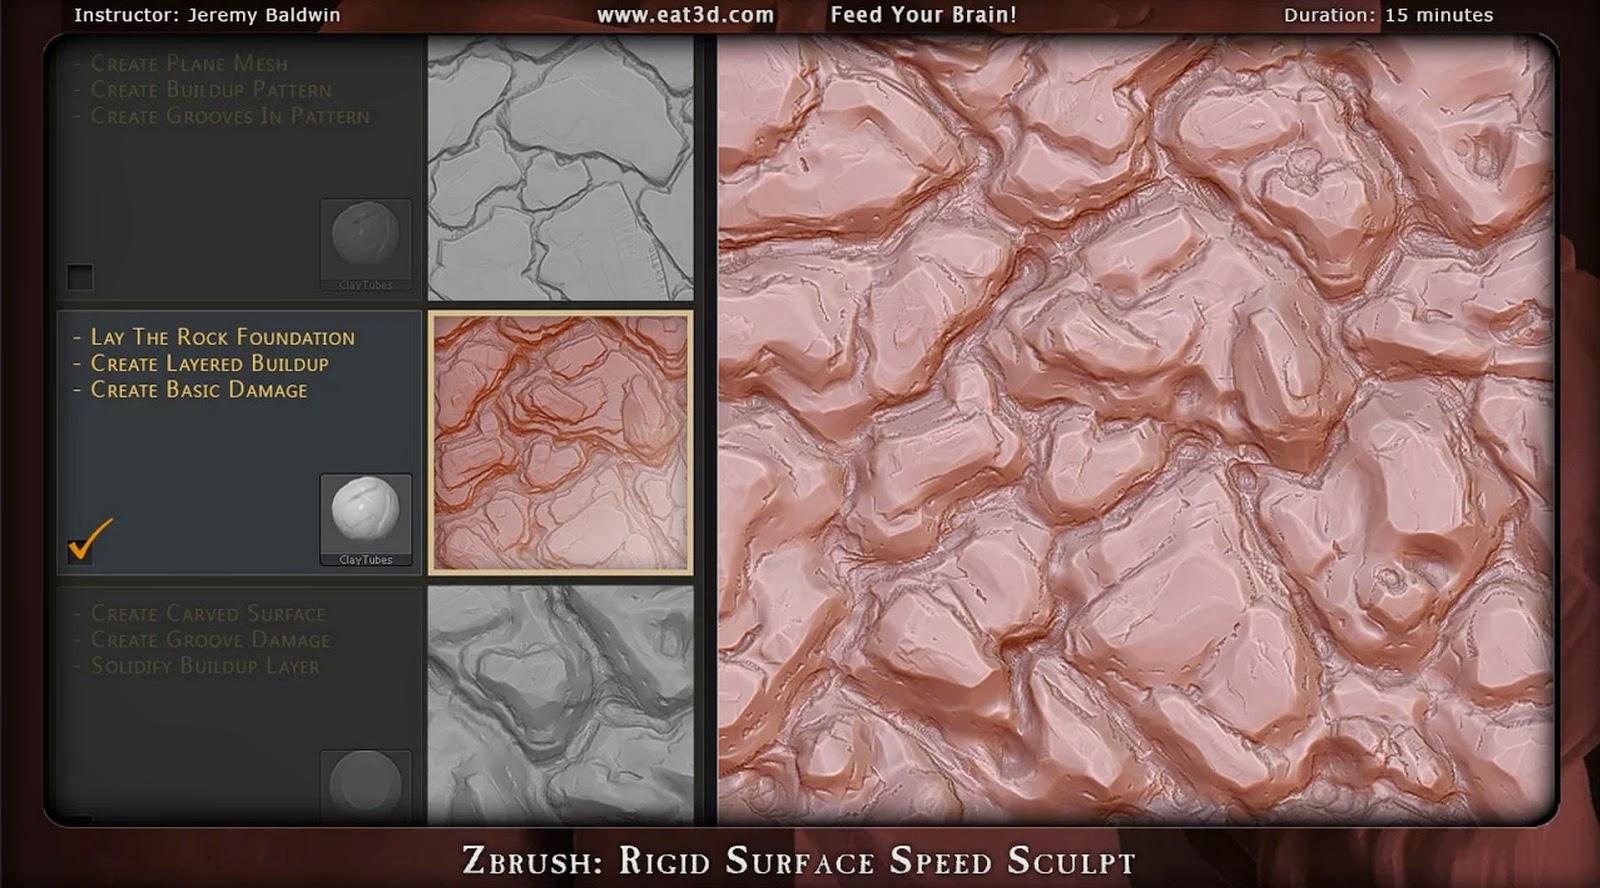 Rigid Surface Speed Sculpt in Zbrush | CG TUTORIAL